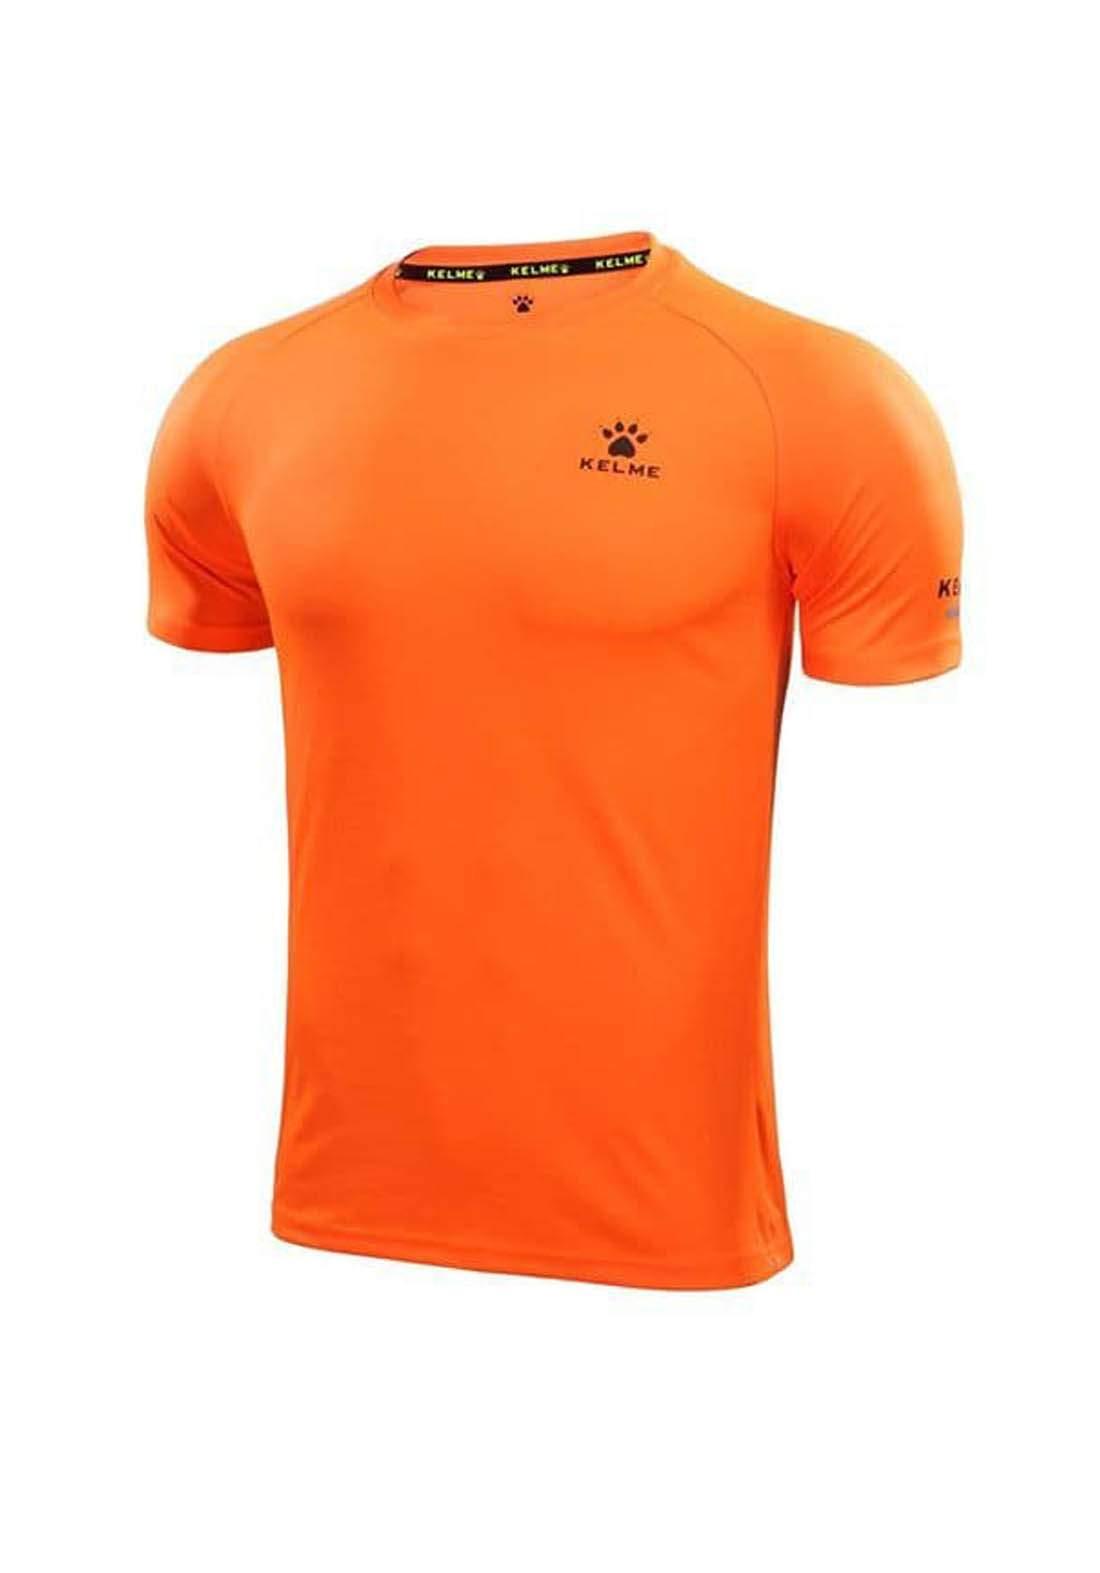 تيشيرت رياضي رجالي برتقالي اللون من Kelme